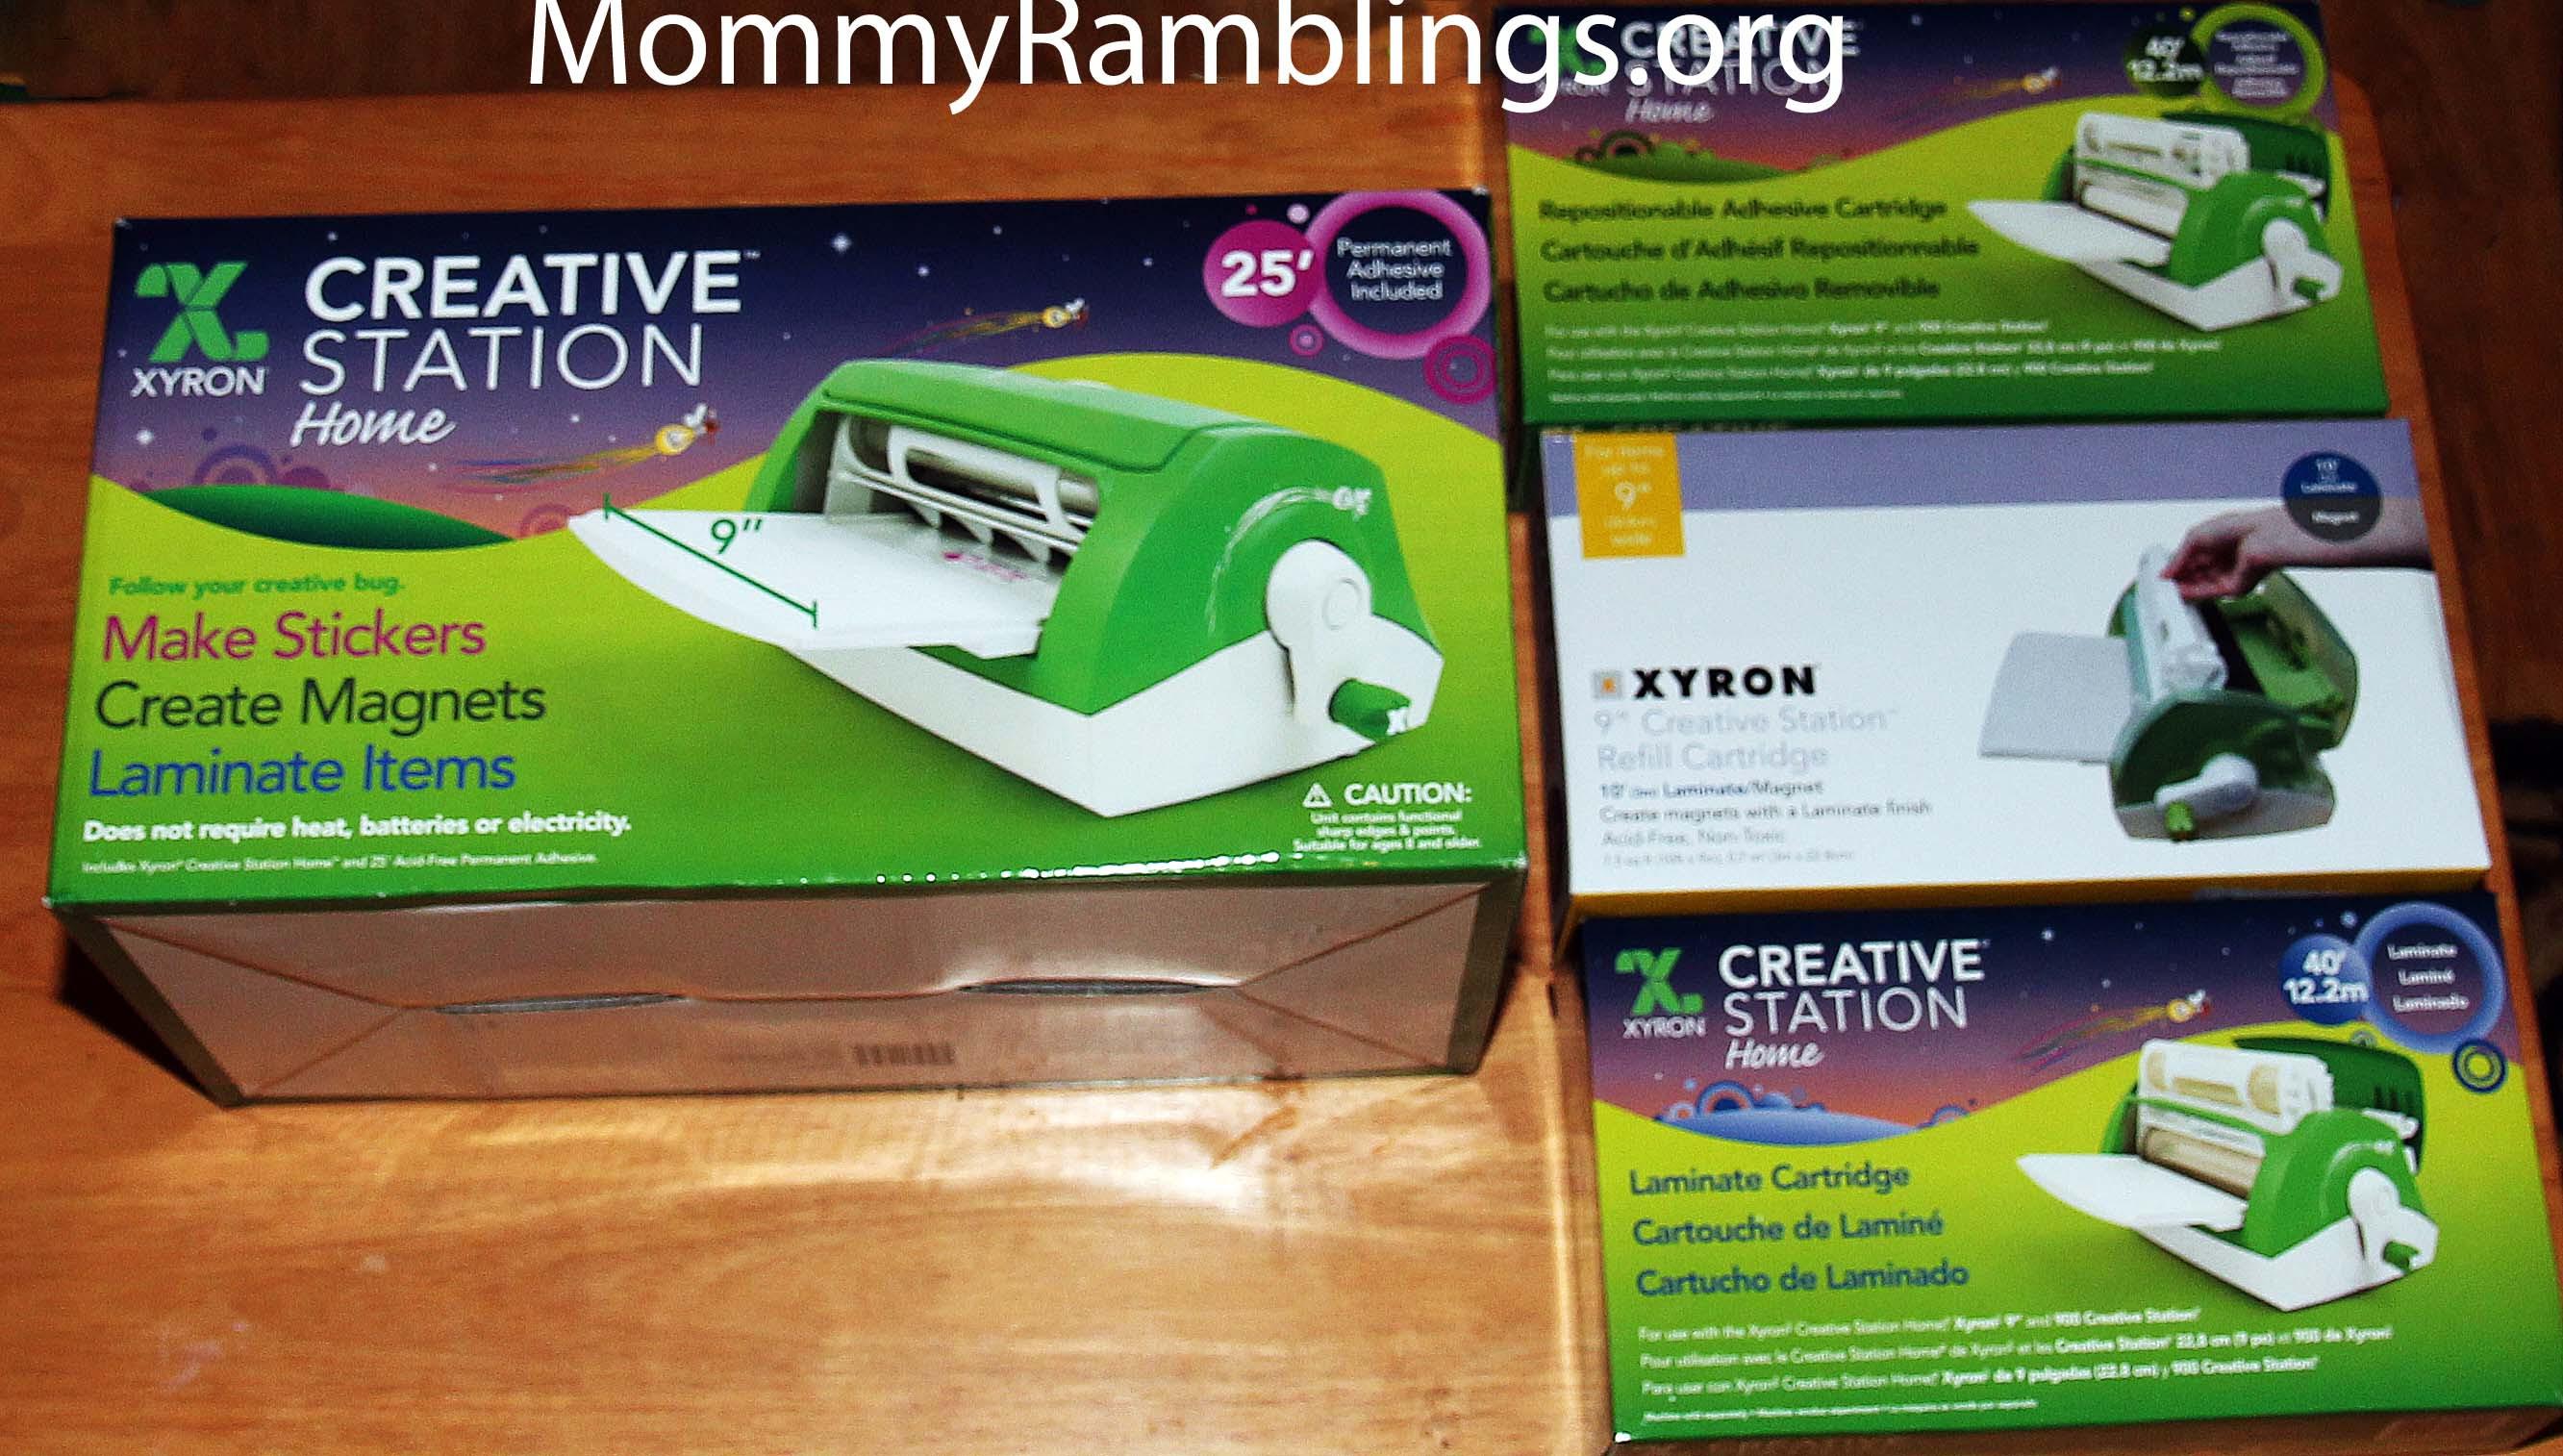 Creative Station Mommy Ramblings